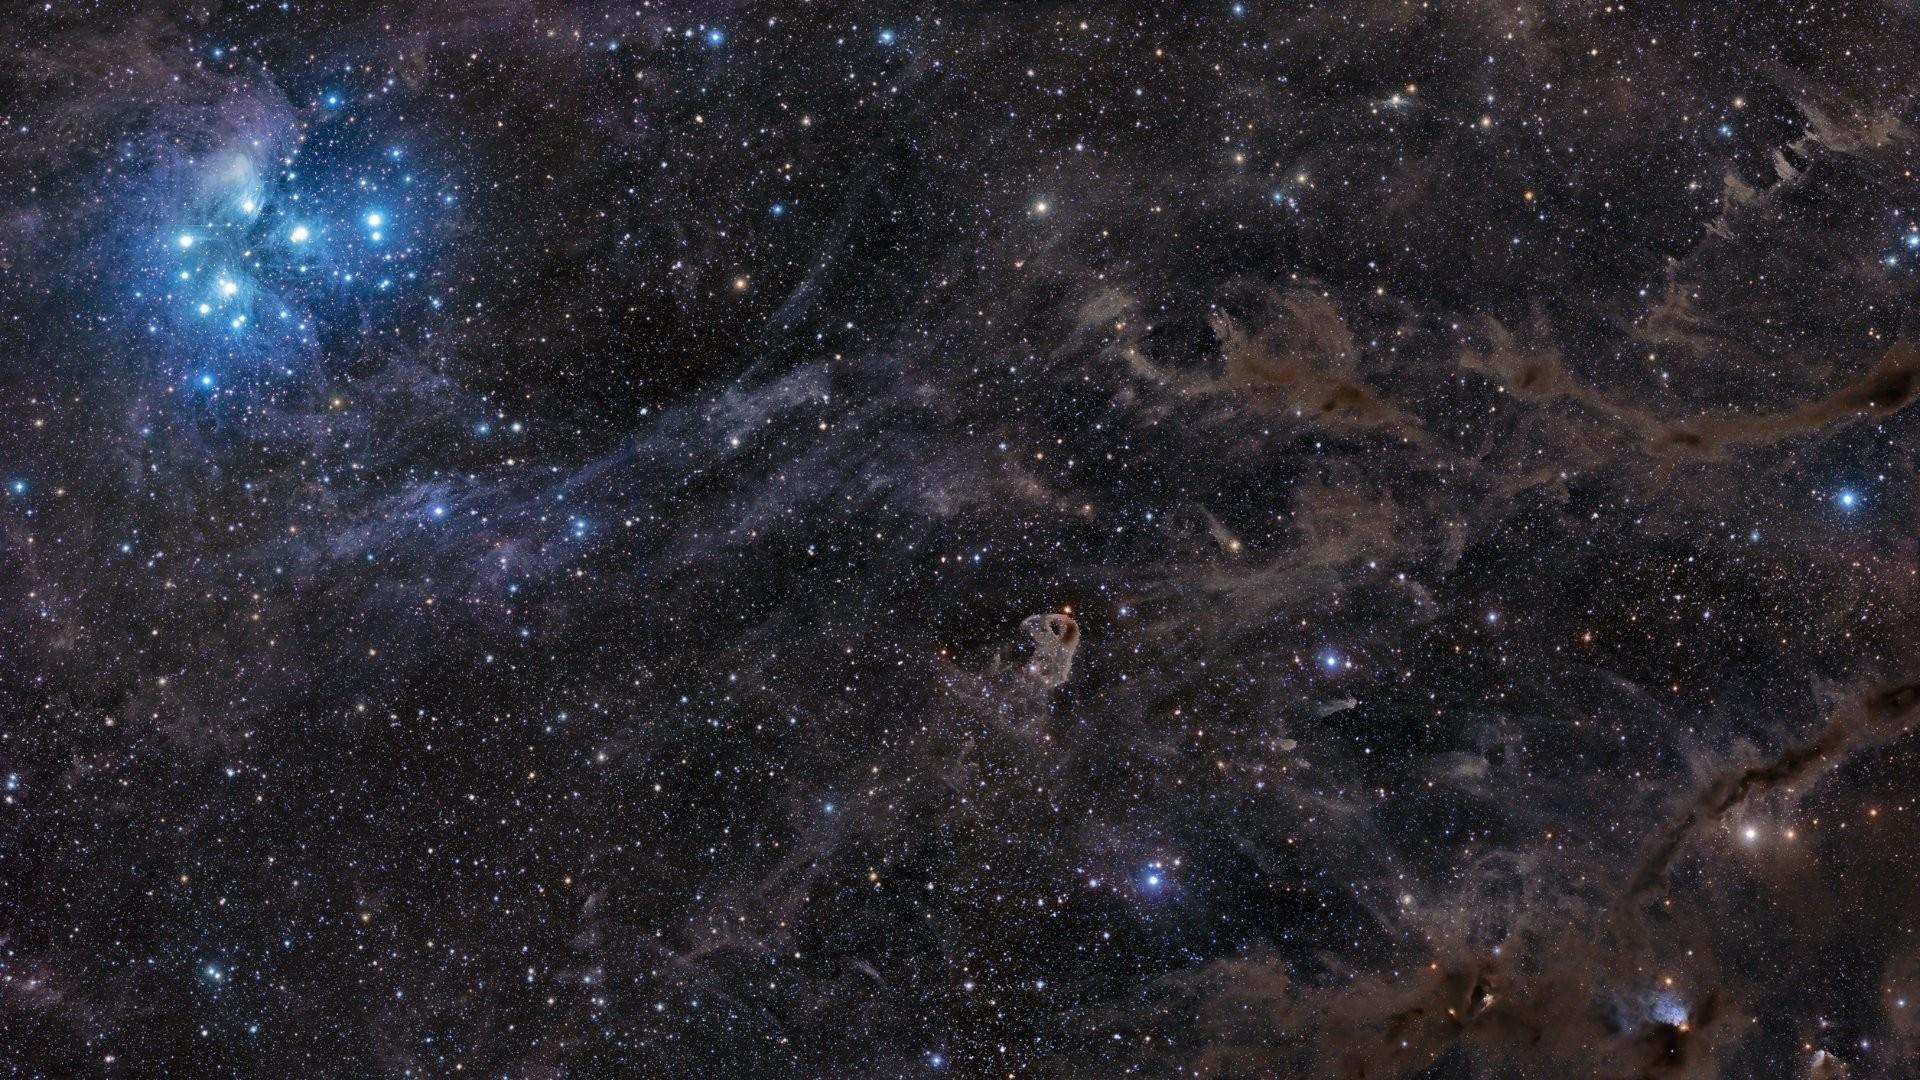 Hubble deep space wallpaper wallpapersafari - Hubble space images wallpaper ...